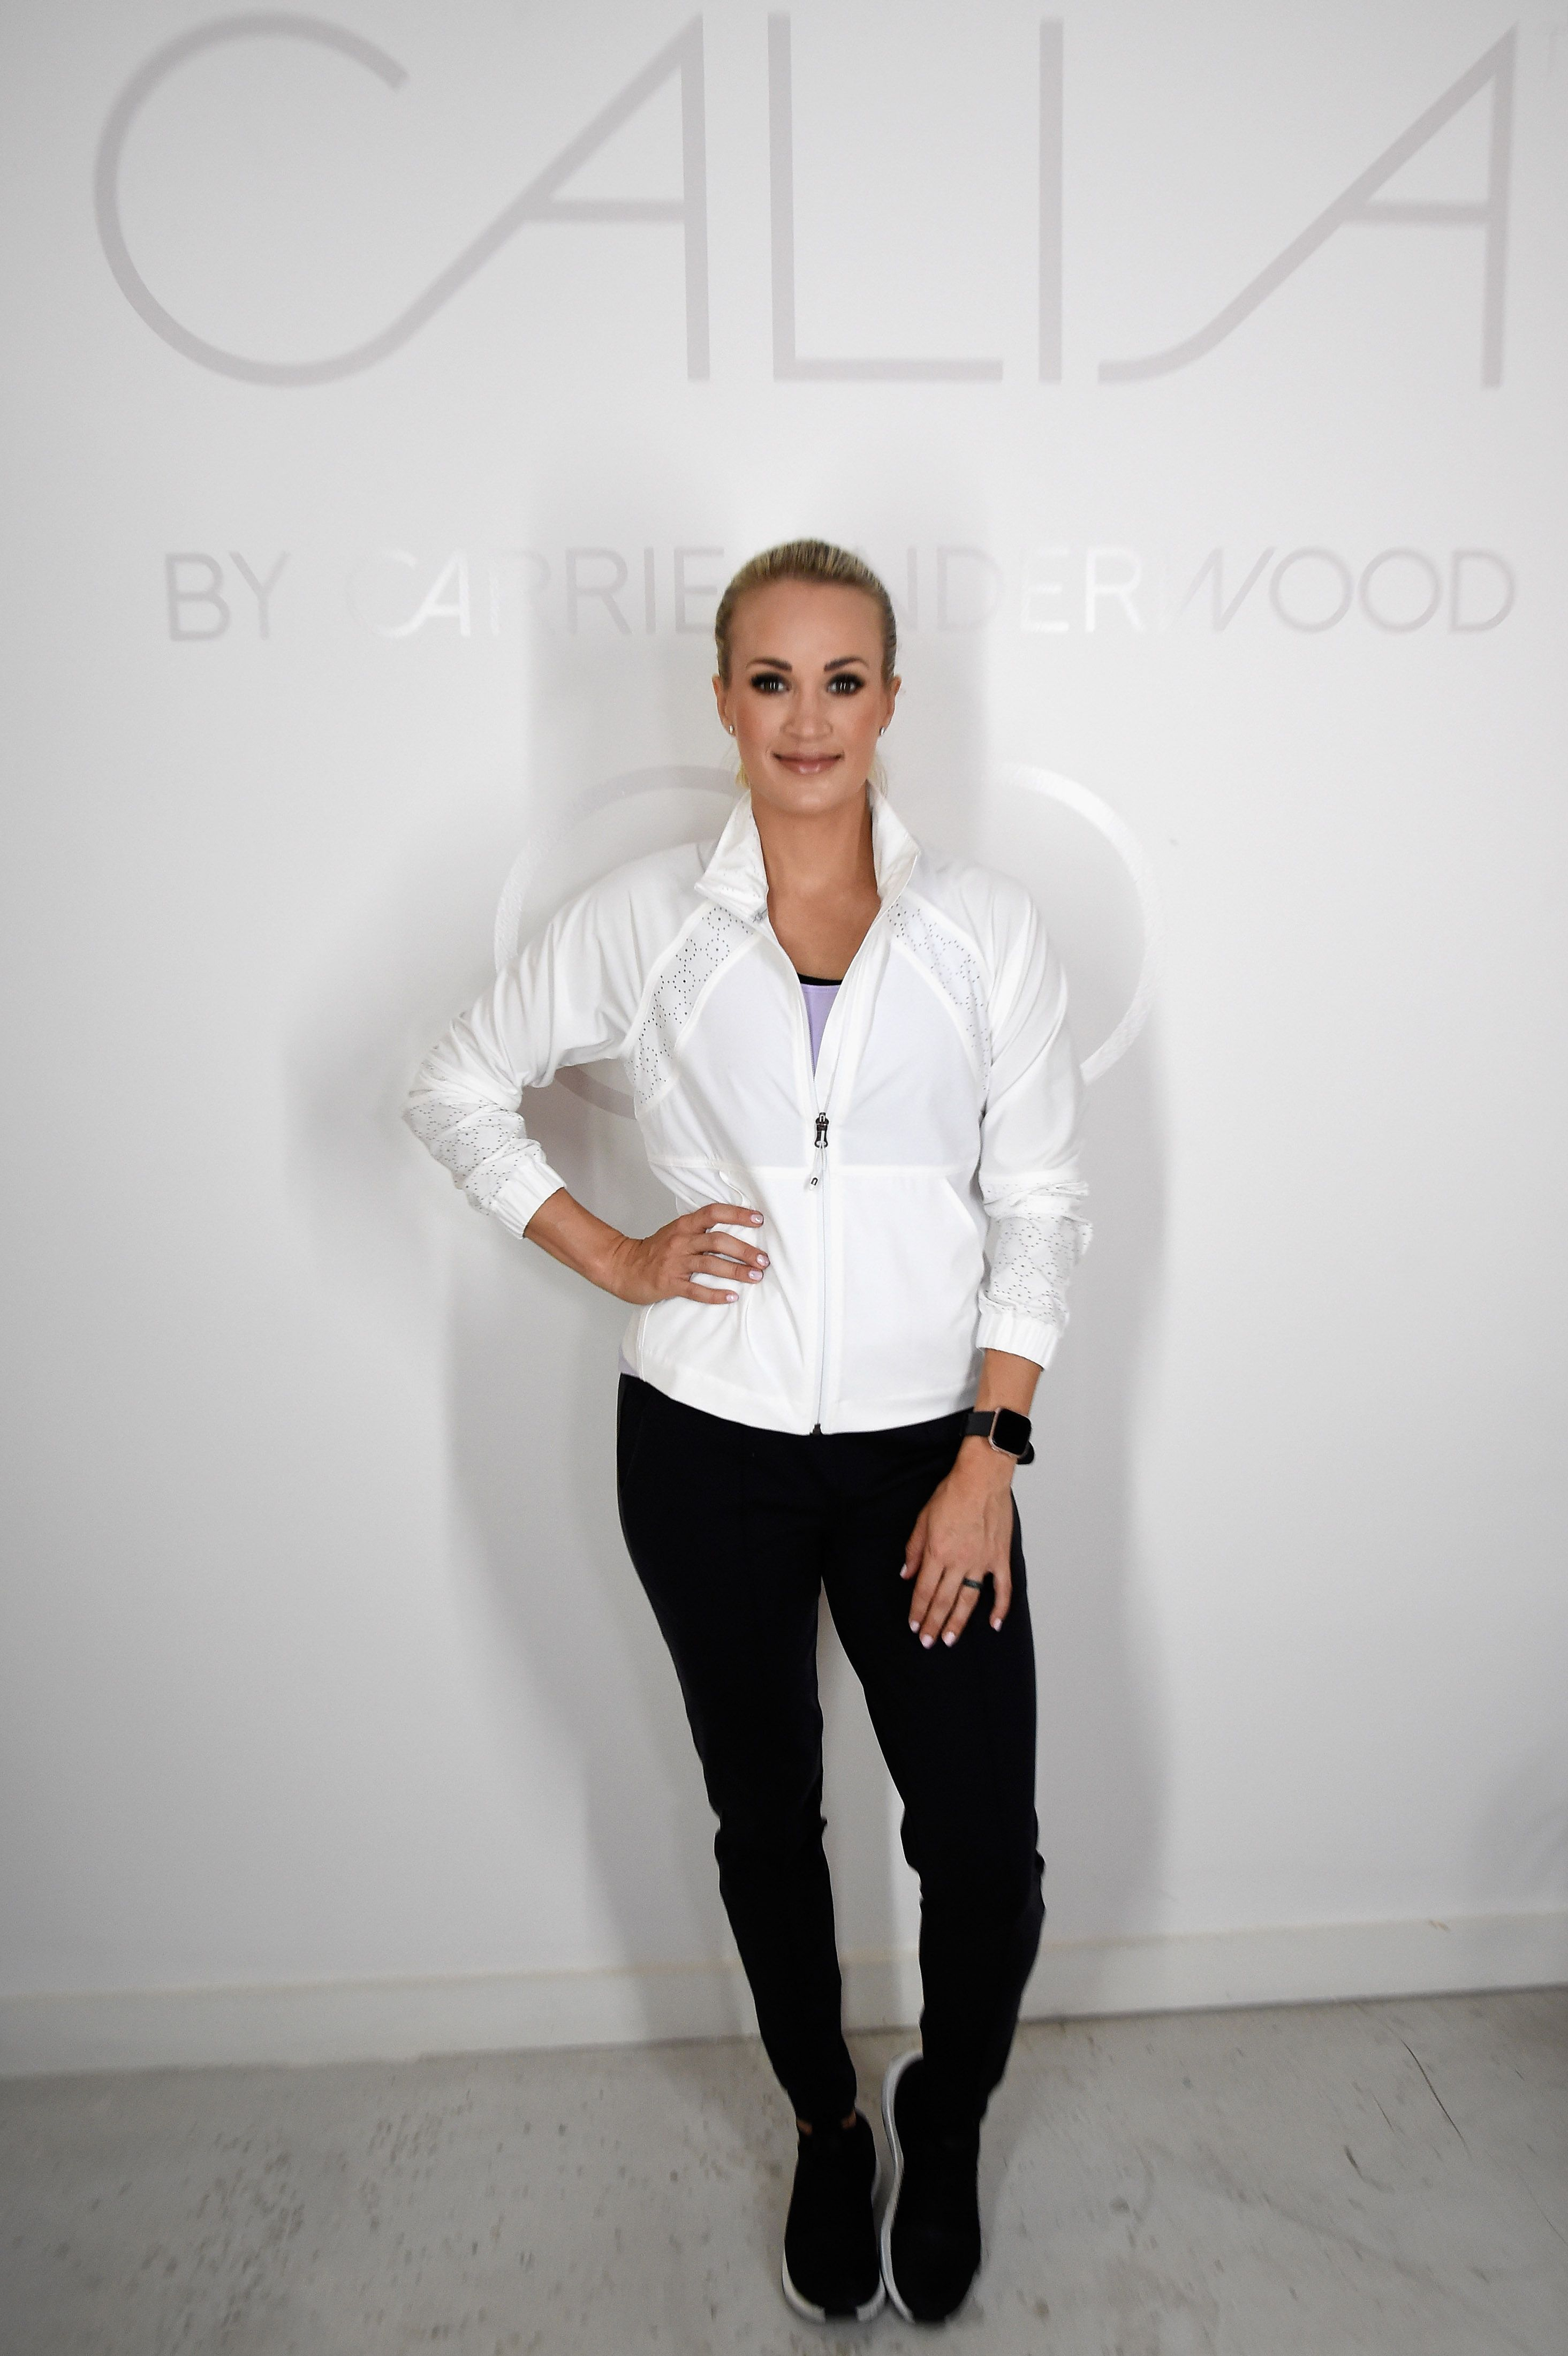 e983fbc06f43 What Carrie Underwood's CALIA Activewear Line Looks Like IRL